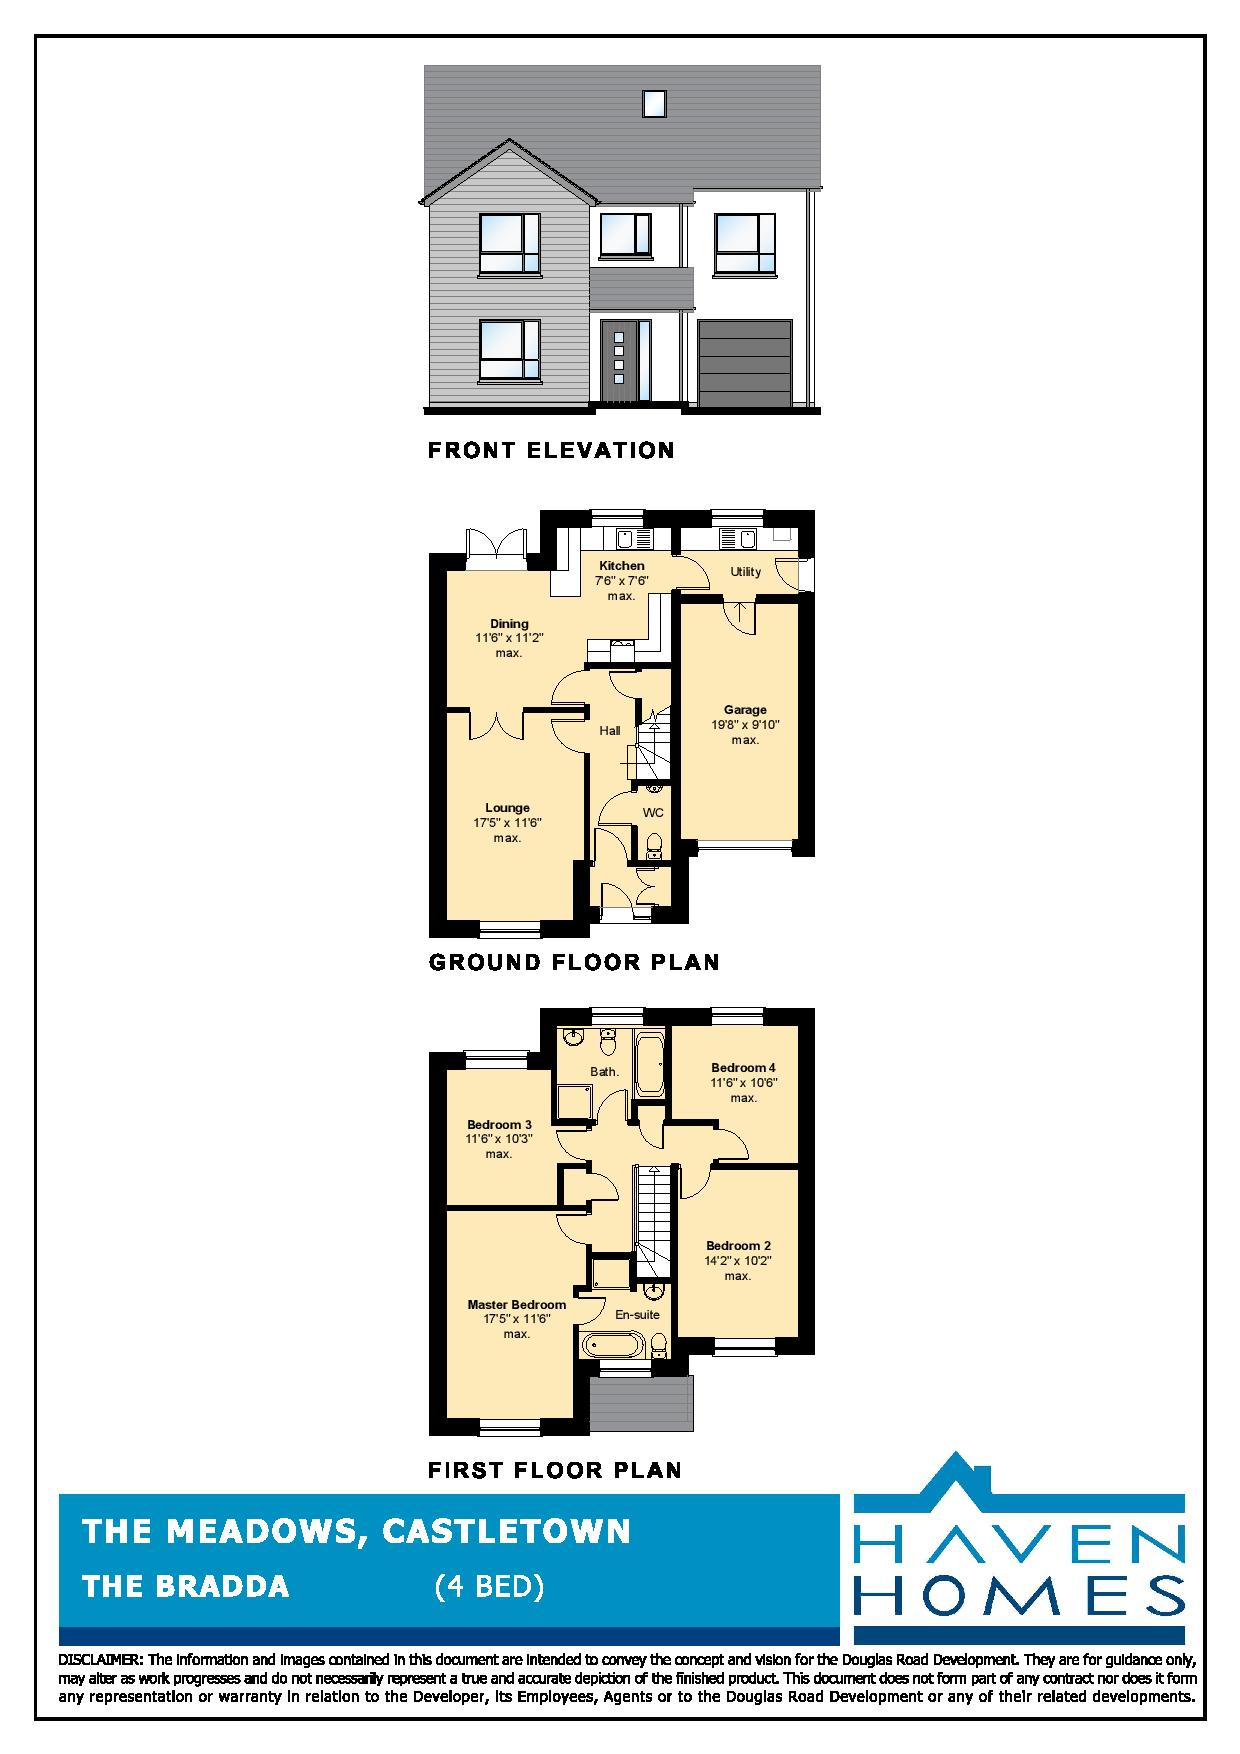 Plot 35, The Meadows, Castletown Floorplan